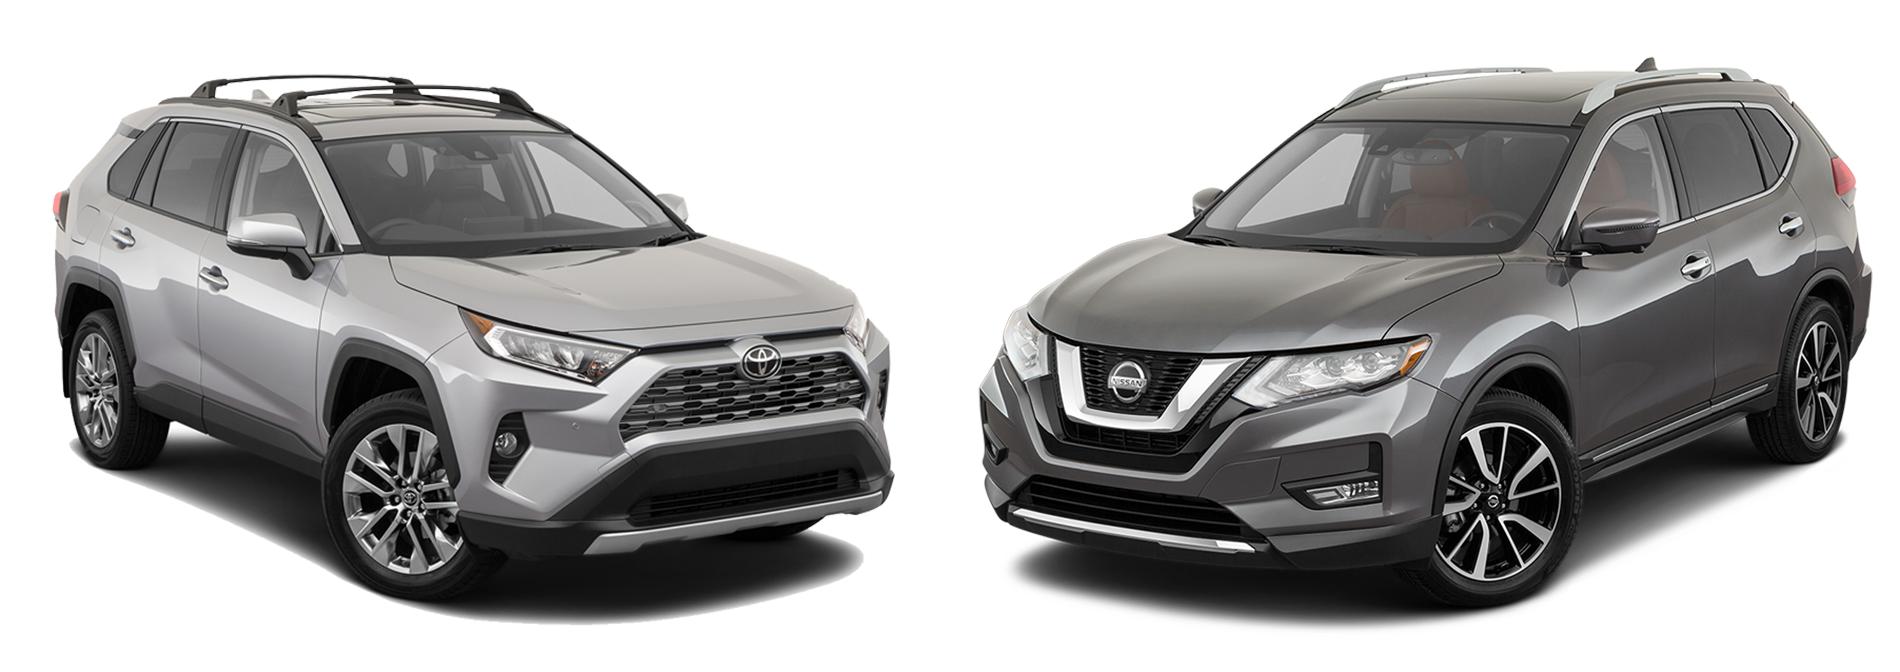 2019 Nissan Rogue vs. 2019 Toyota RAV4 in New Braunfels, TX